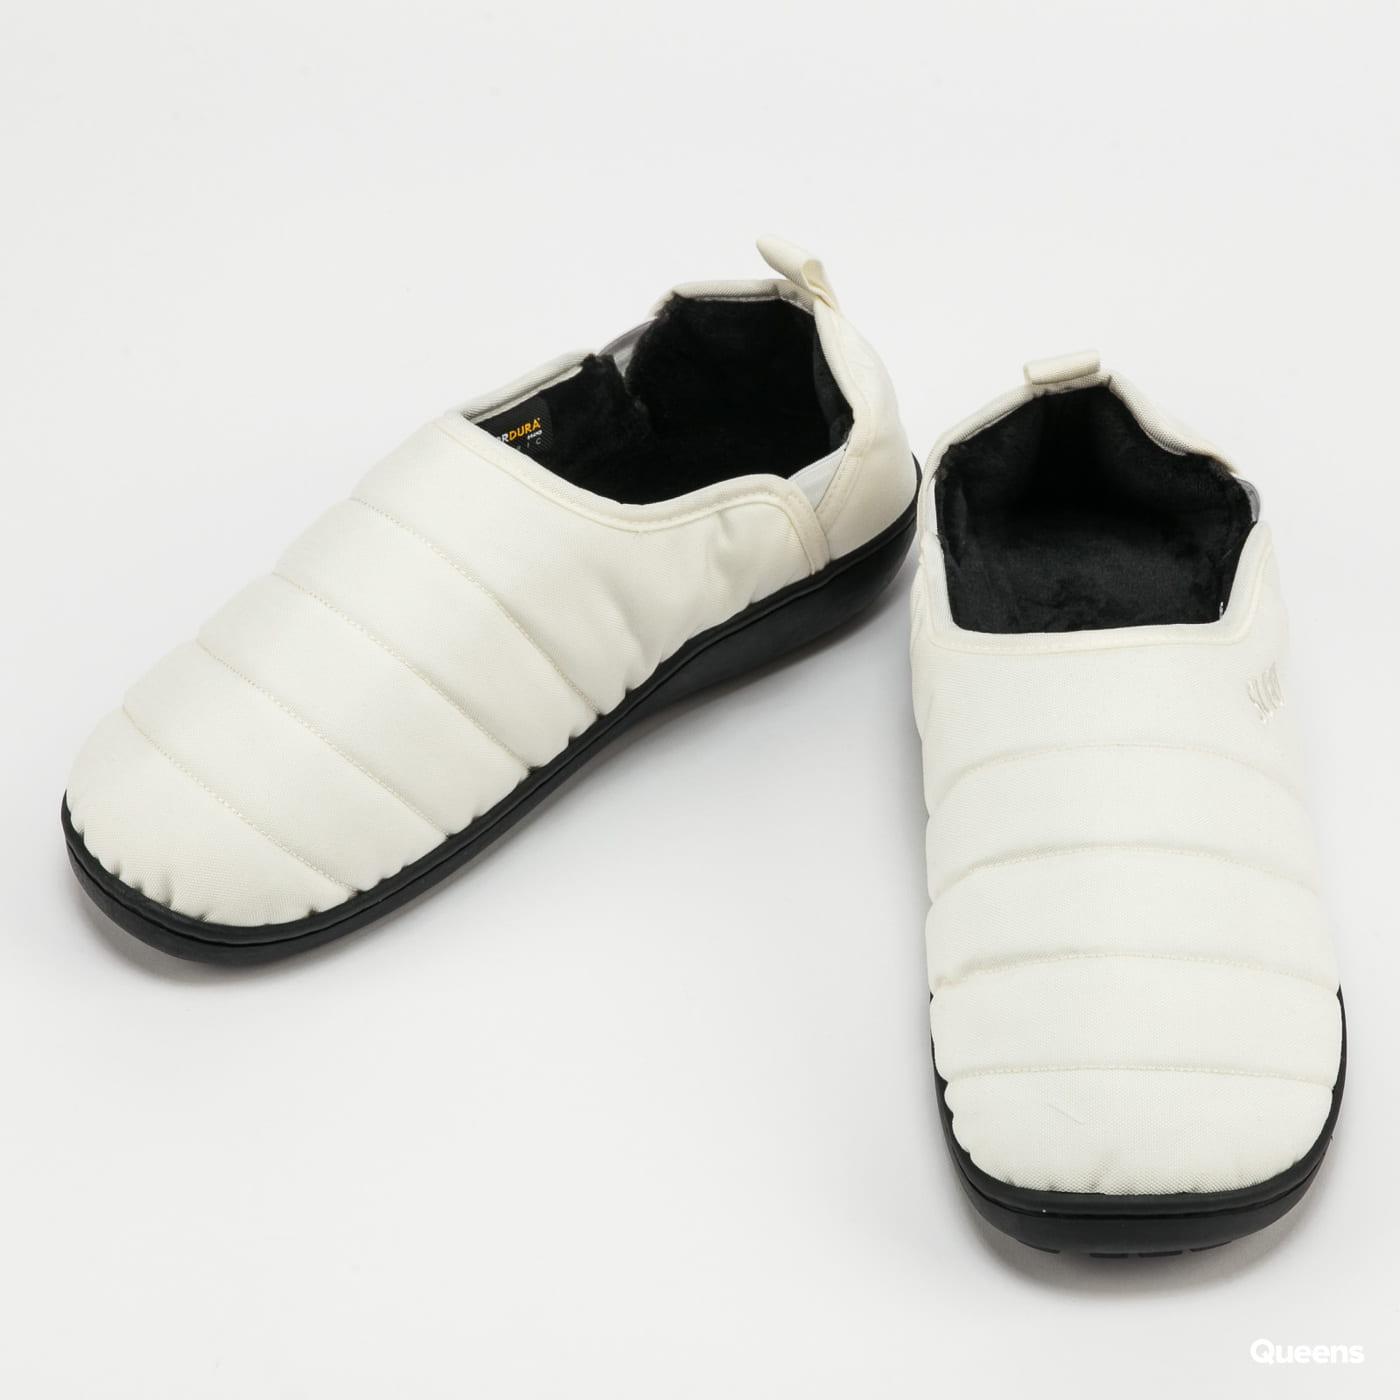 SUBU The Winter Sandals mono white